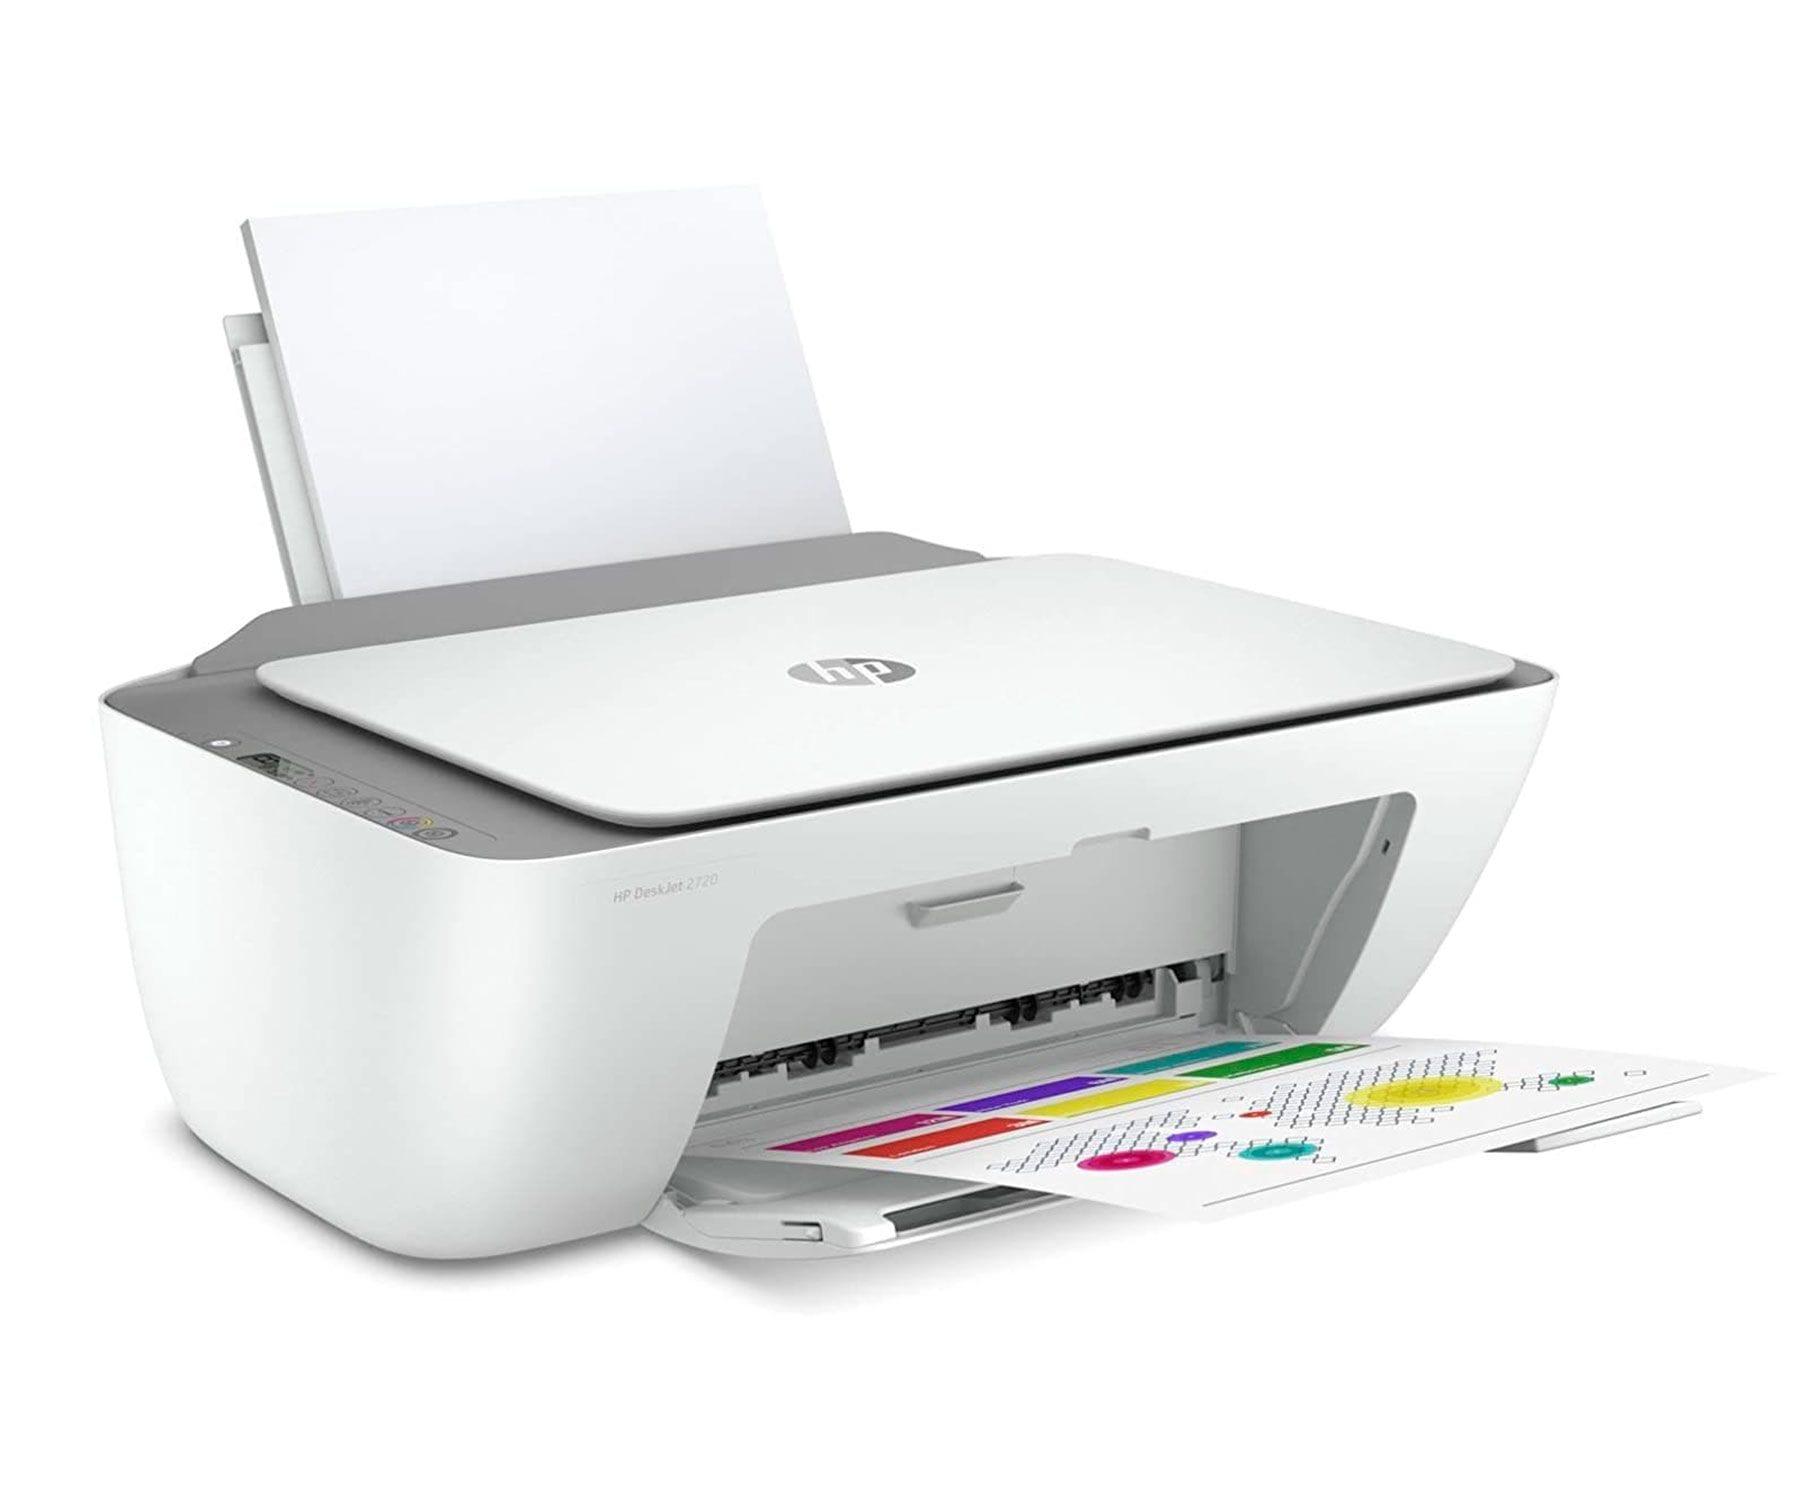 Hp Deskjet 2720e Impresora multifunción/Escáner /Fotocopia/Wifi